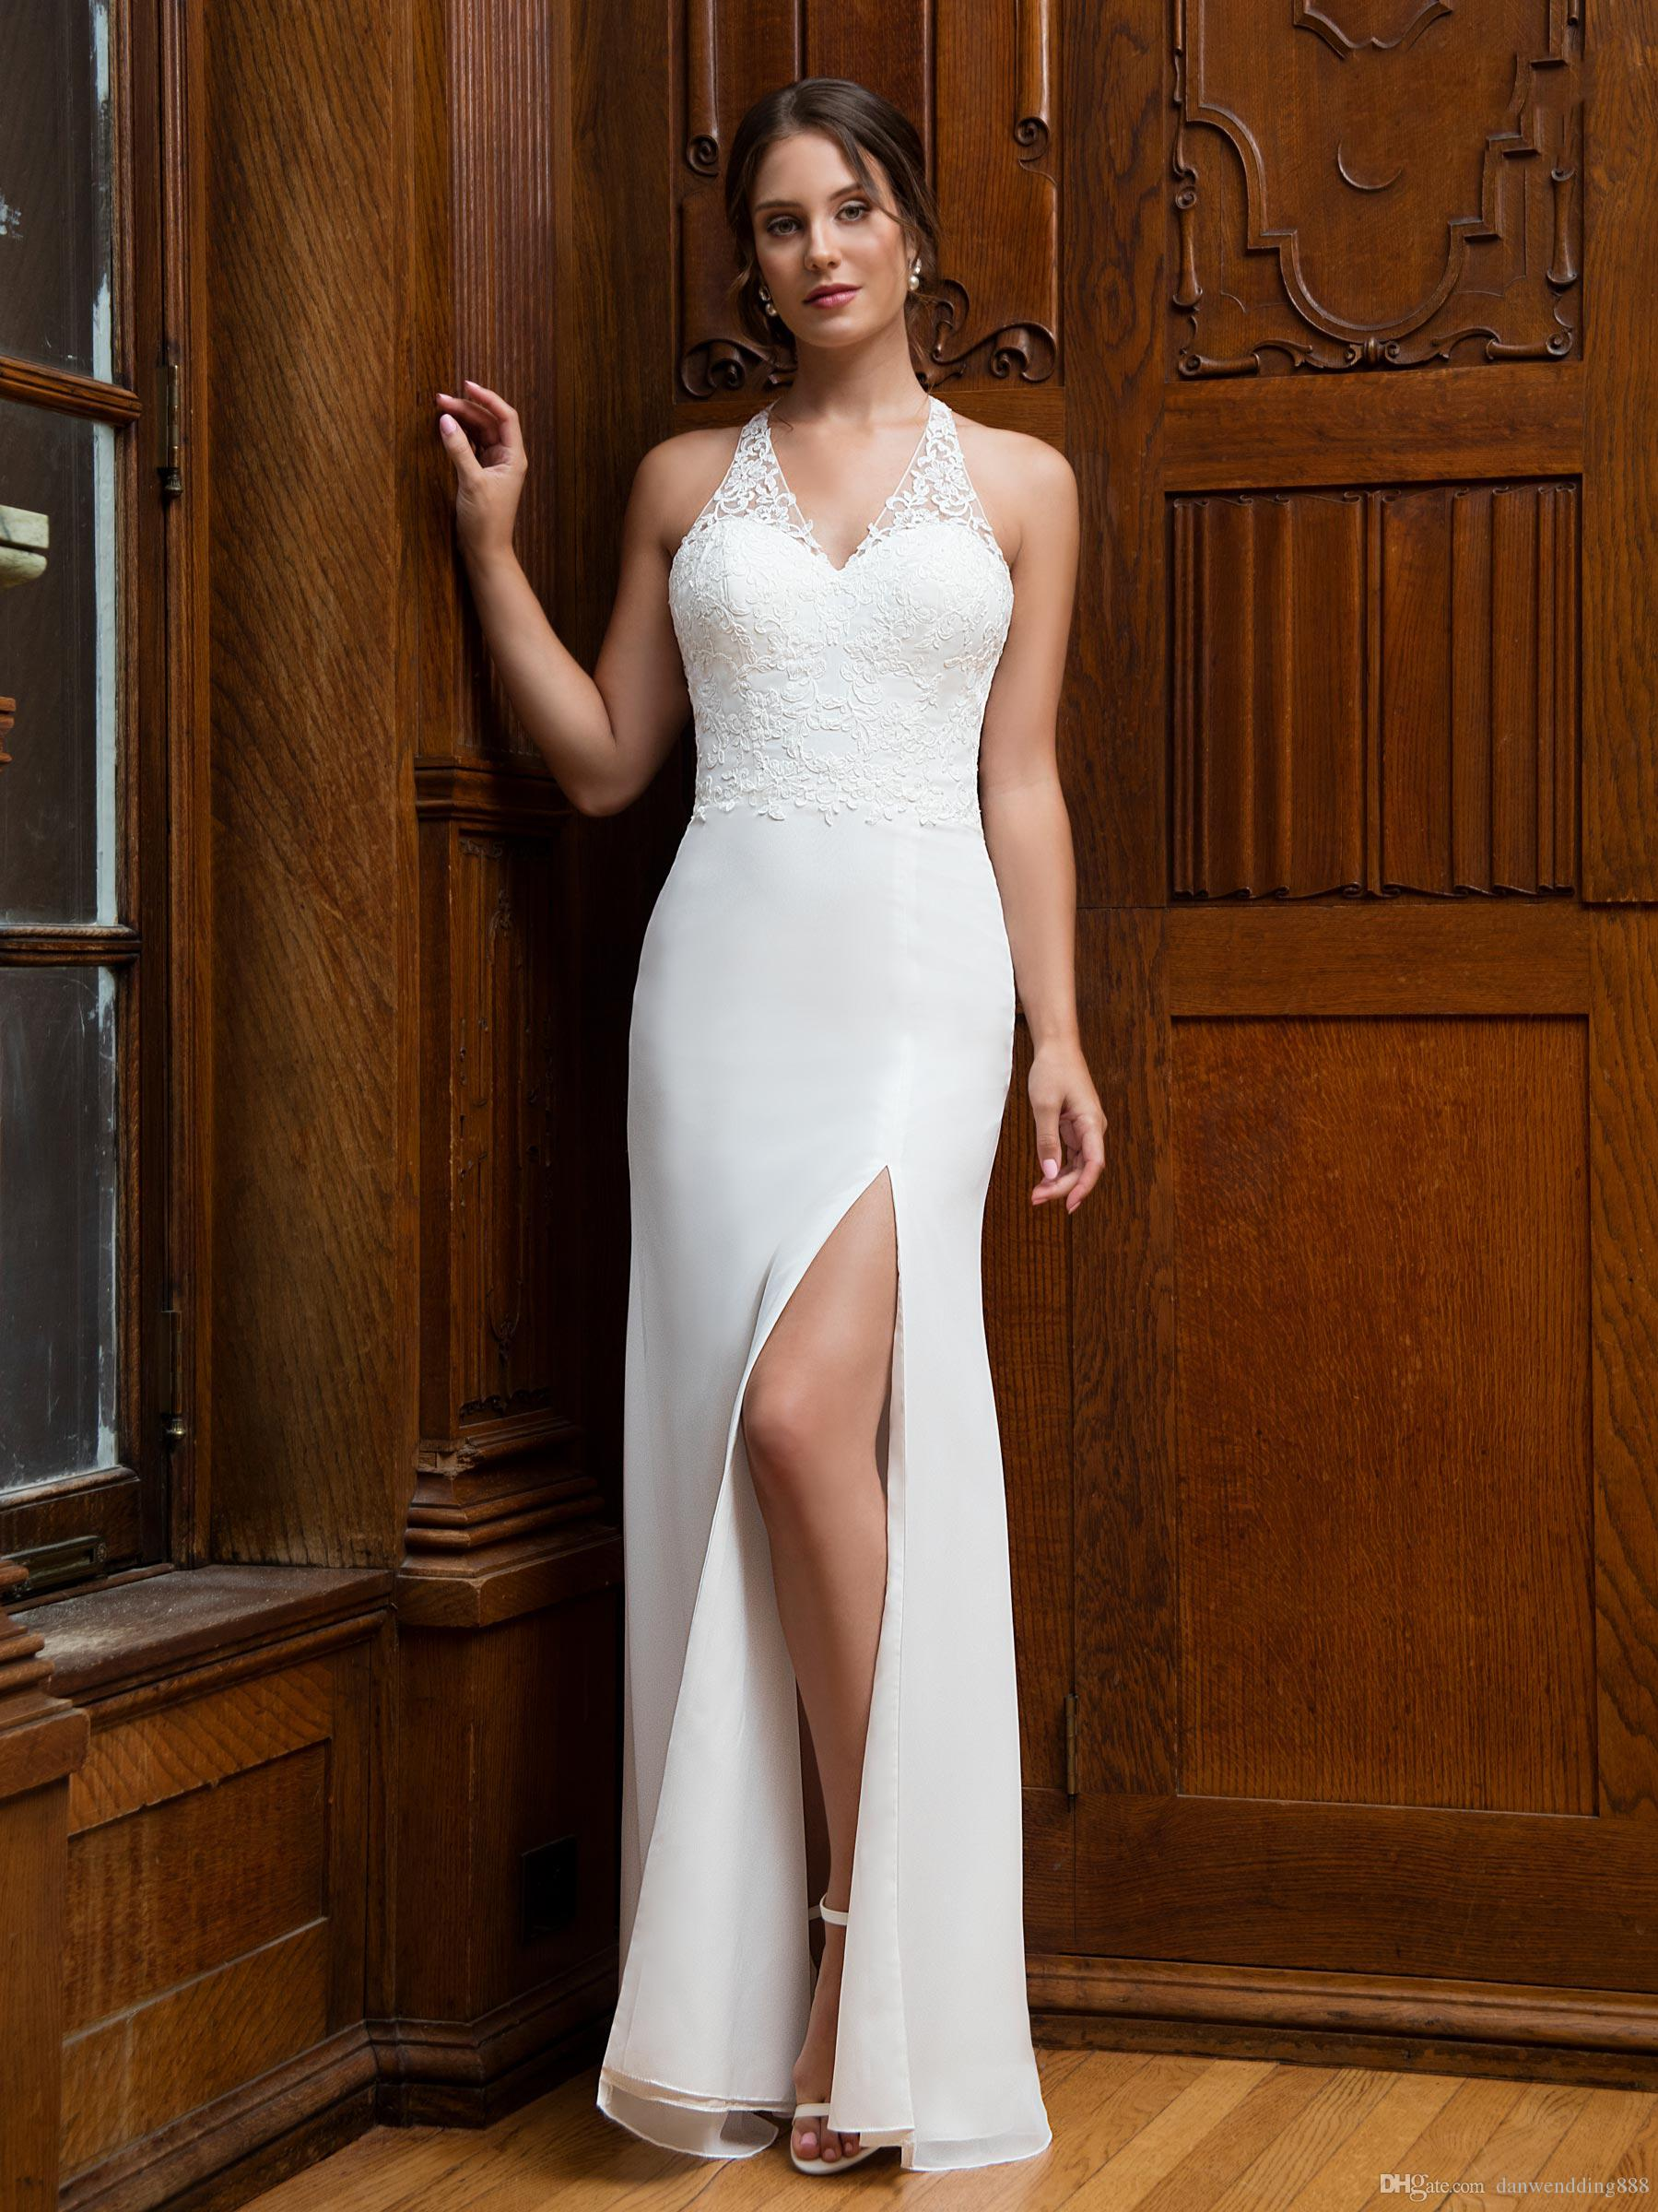 5481eab1fe8 Sexy White Ivory Chiffon Halter V Neck Slit Applique Sheath Wedding Dresses  Bridal Gowns Bridal Party Dresses Custom Size 2 18 WW212191 Halter Neck  Wedding ...